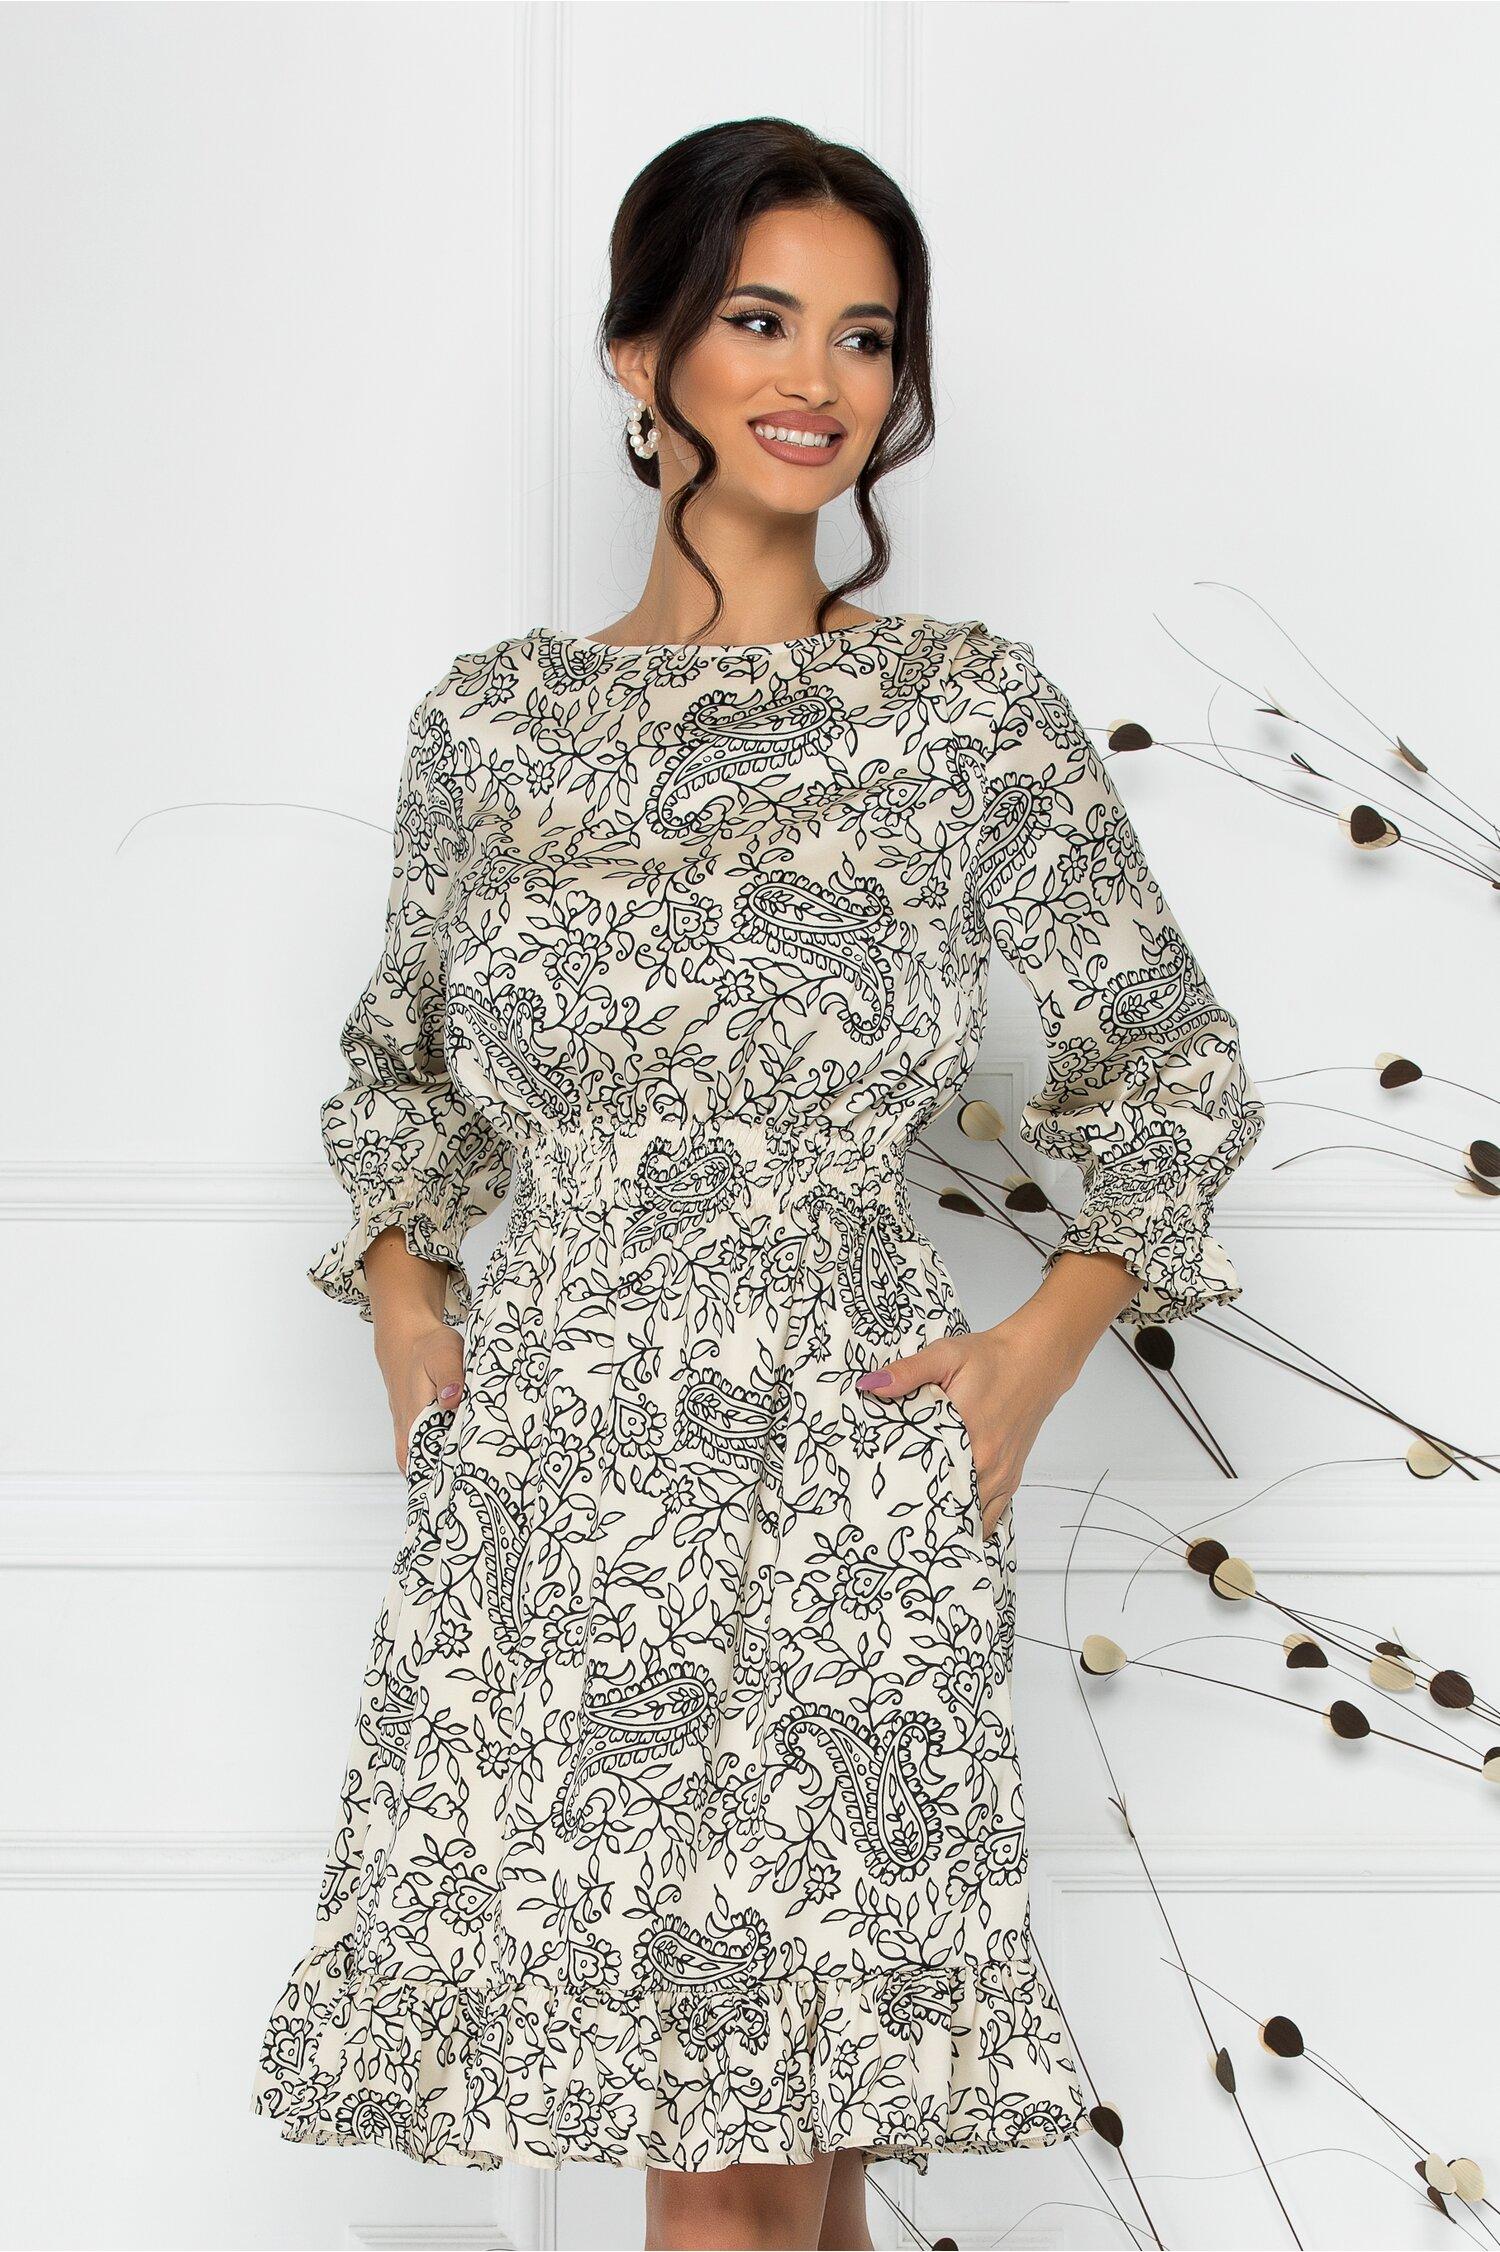 Rochie Natalia ivoire cu imprimeu divers